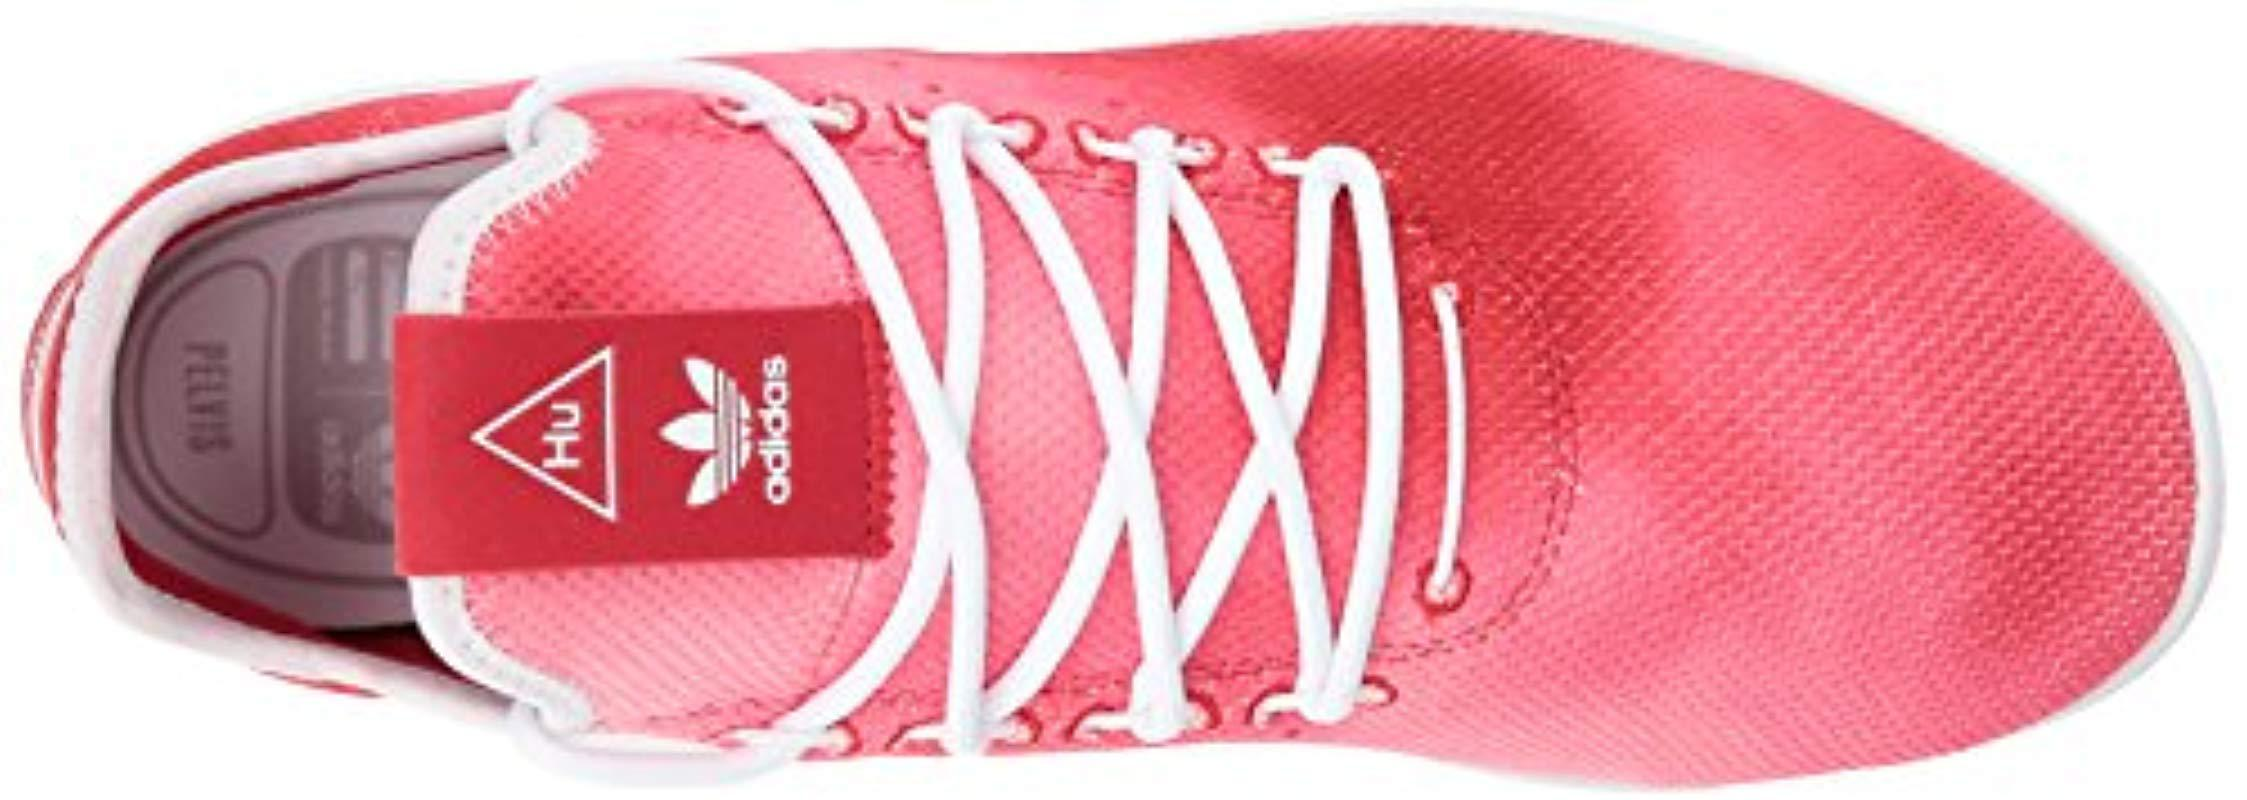 2e20d0153d14 Lyst - adidas Originals Pharrell Williams Tennis Human Race (scarlet ...